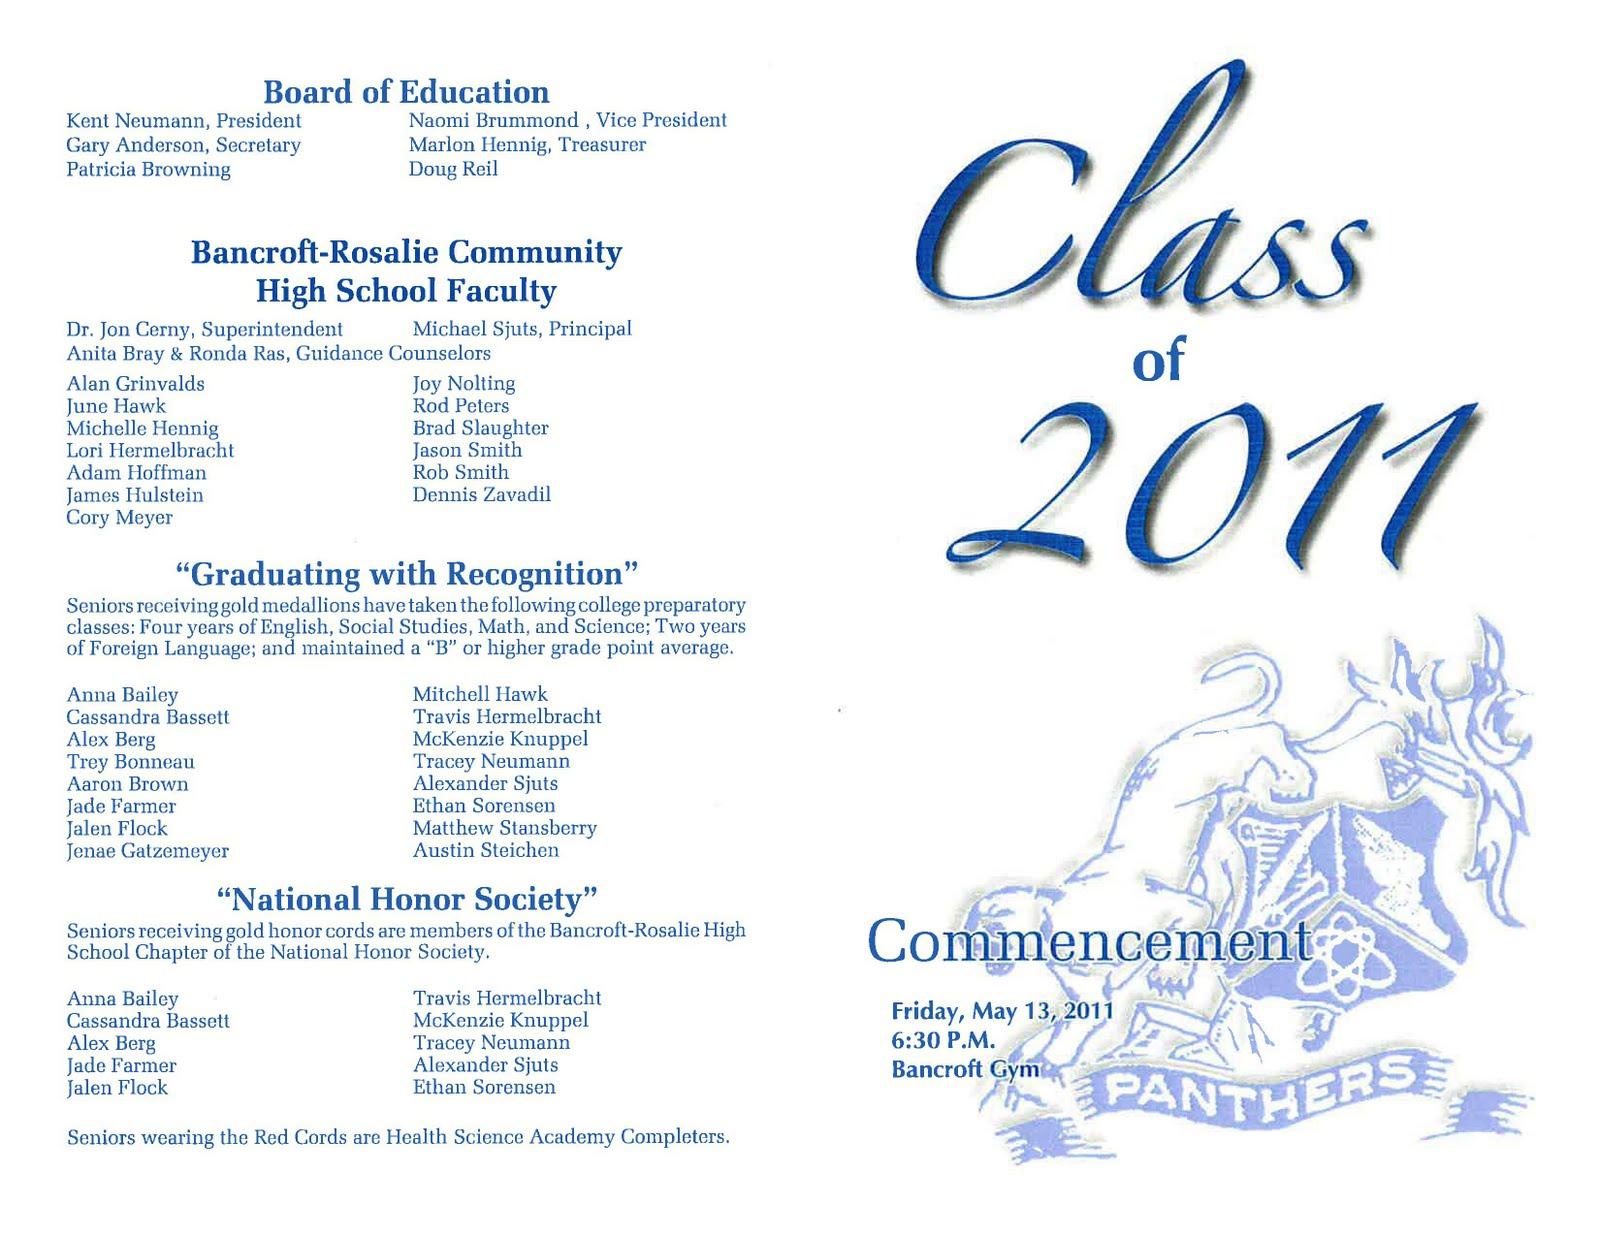 Dr. Cerny's B-R Hype: Graduation Tonight